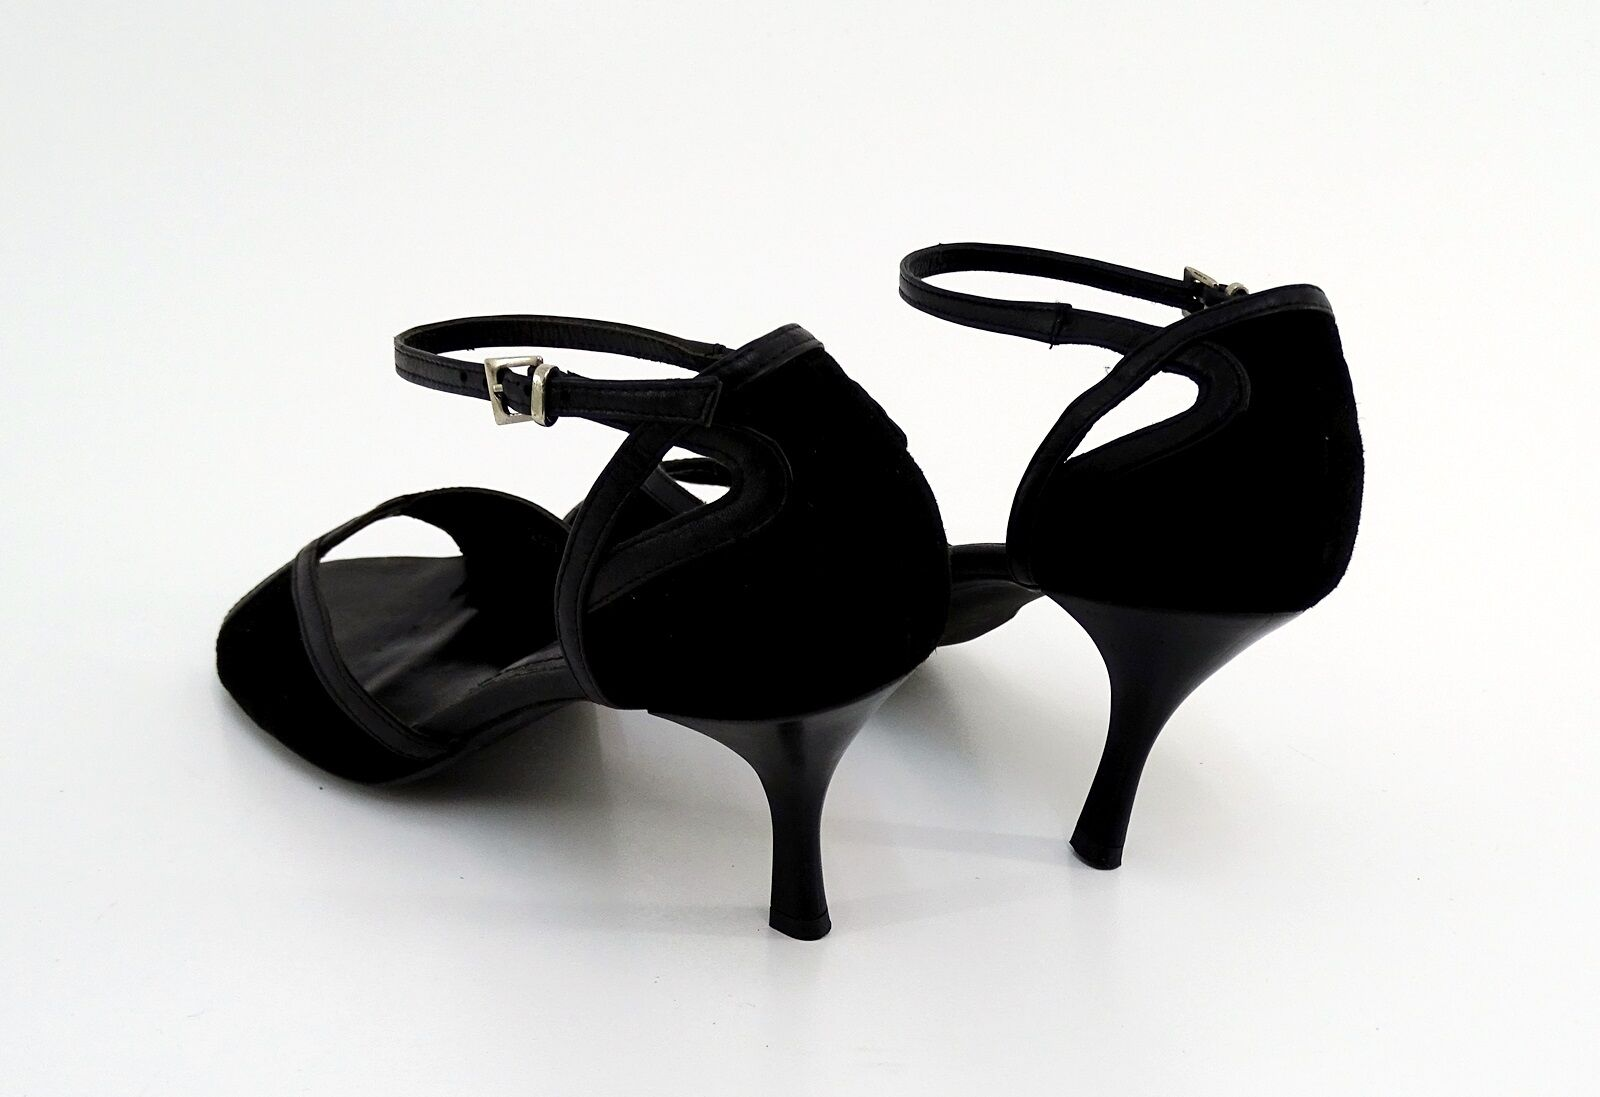 Sandalen Brado Stiletto 40 Echtleder schwarz Gr. 40 Stiletto 7c25ec